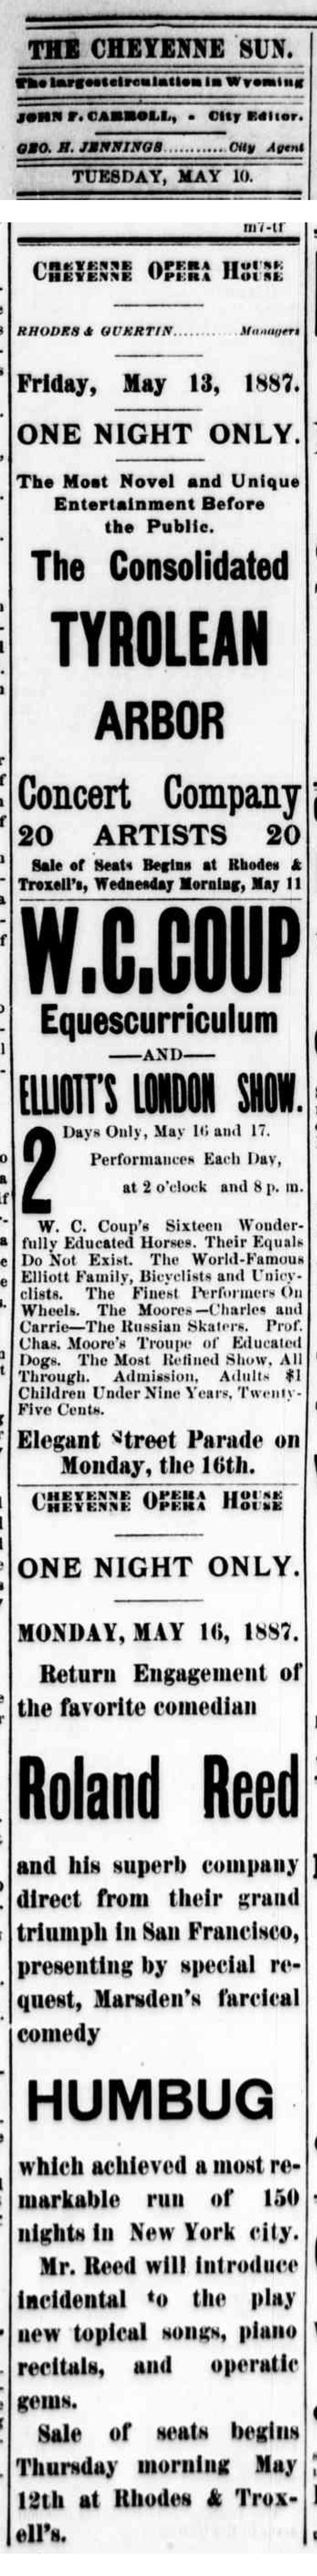 1887-Cheyenne Daily Sun no. 52 May 10, 1887, page 3-Roland-cornetstone.jpg